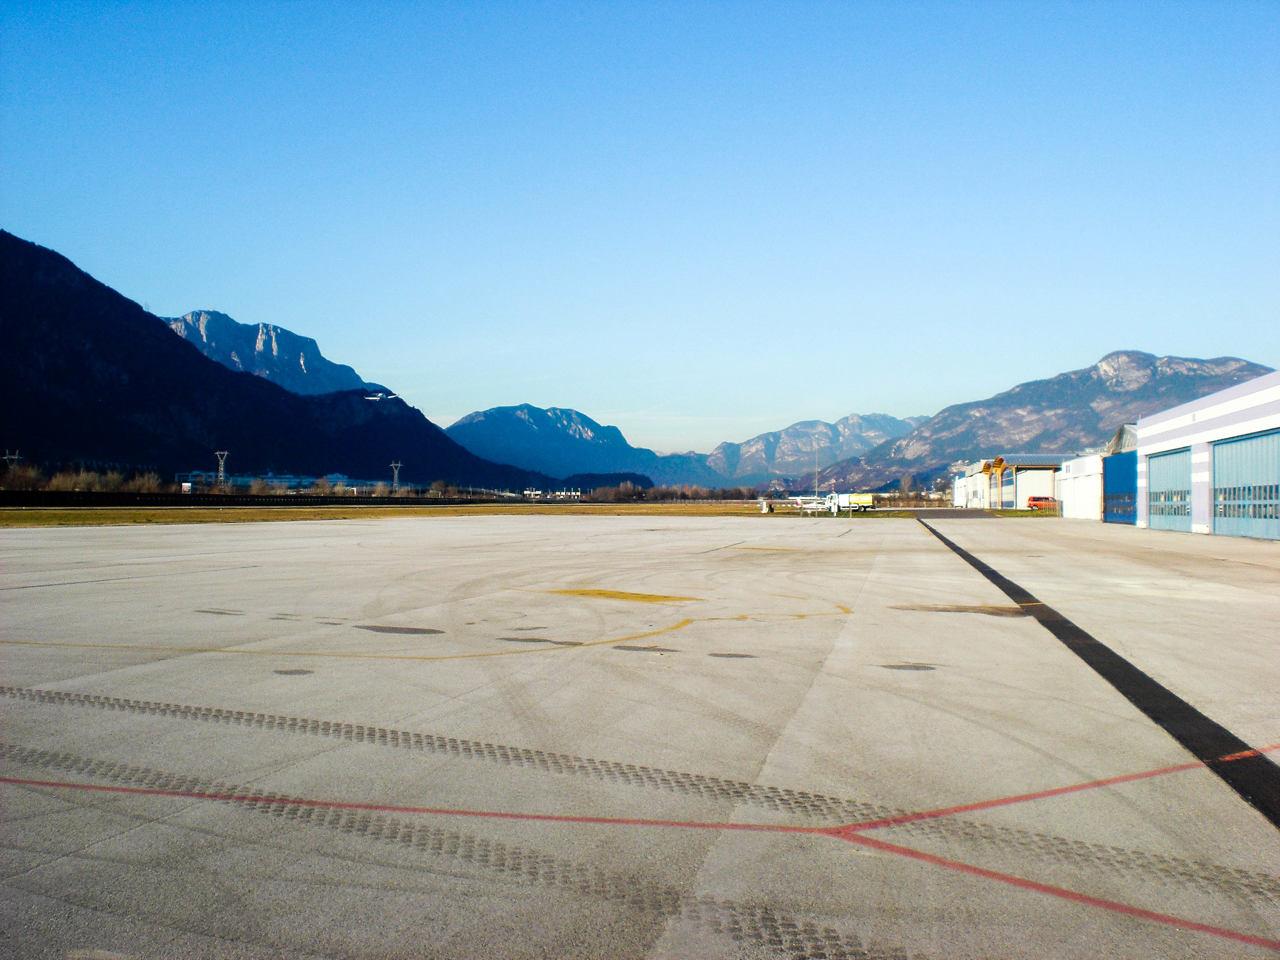 Aeroporto Trento : Arrivare in alto adige aereo